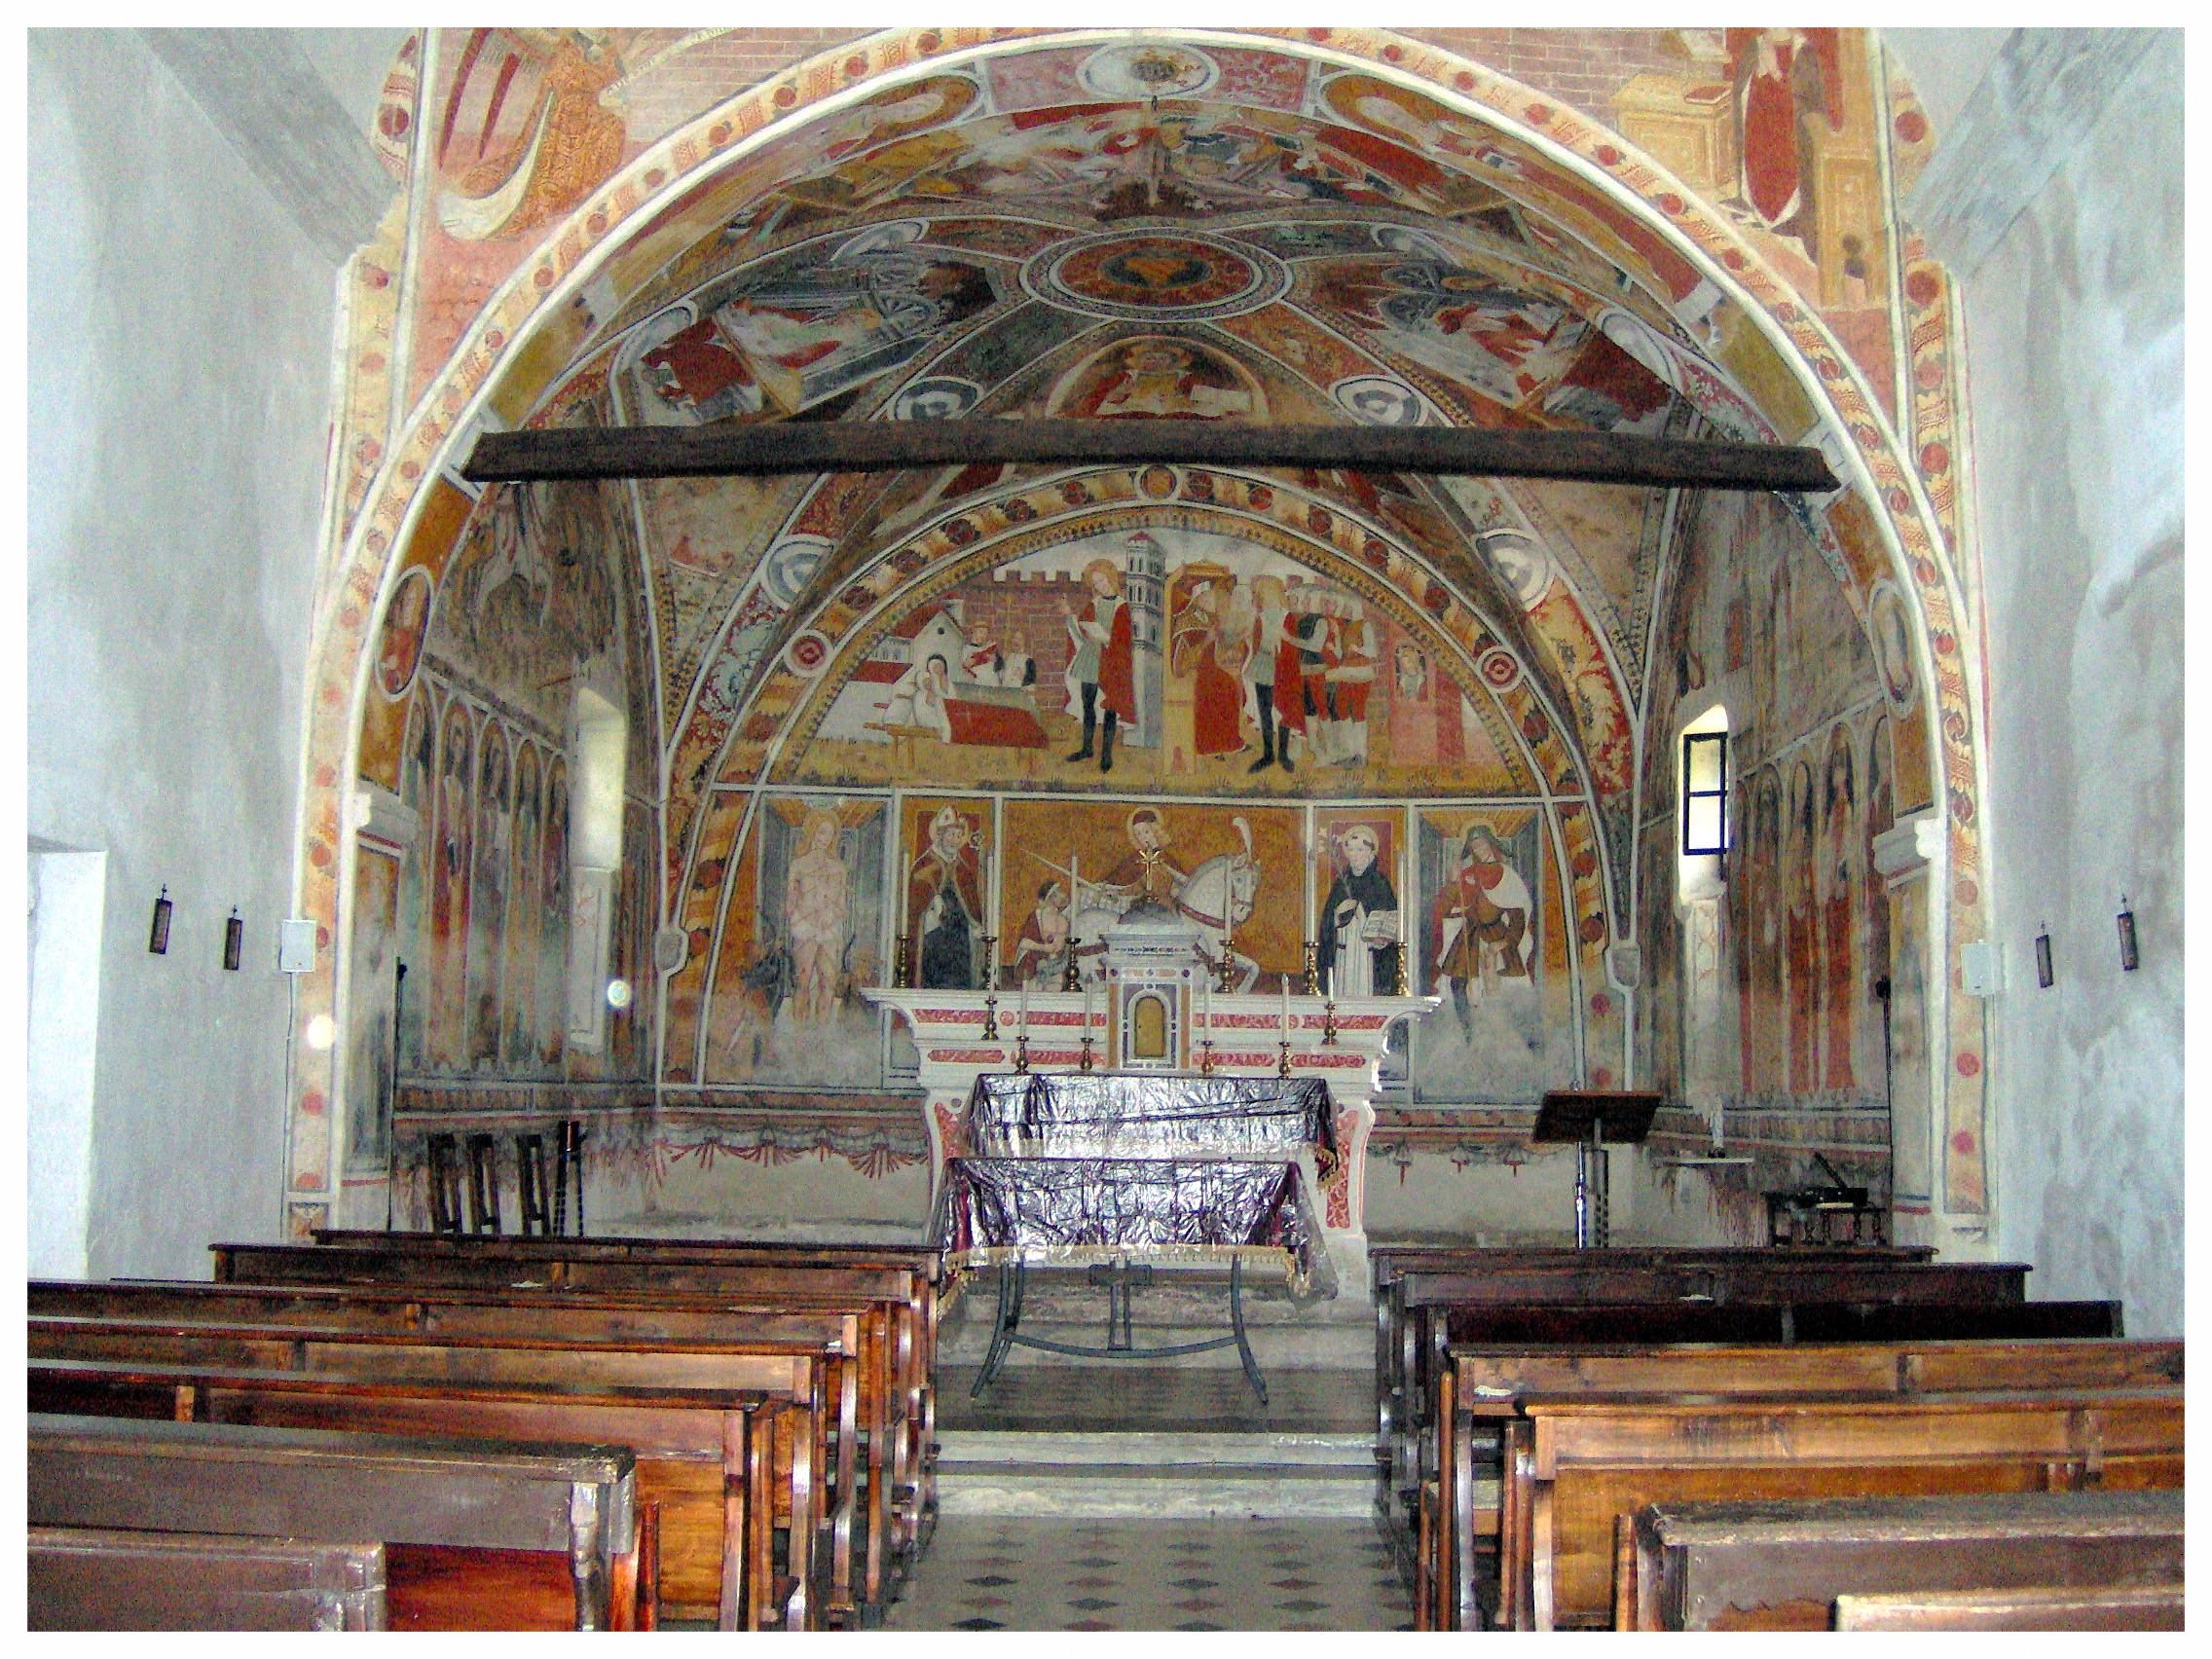 saliceto cuneo piemonte comune langhe roero turismo affreschi storia cultura.jpg